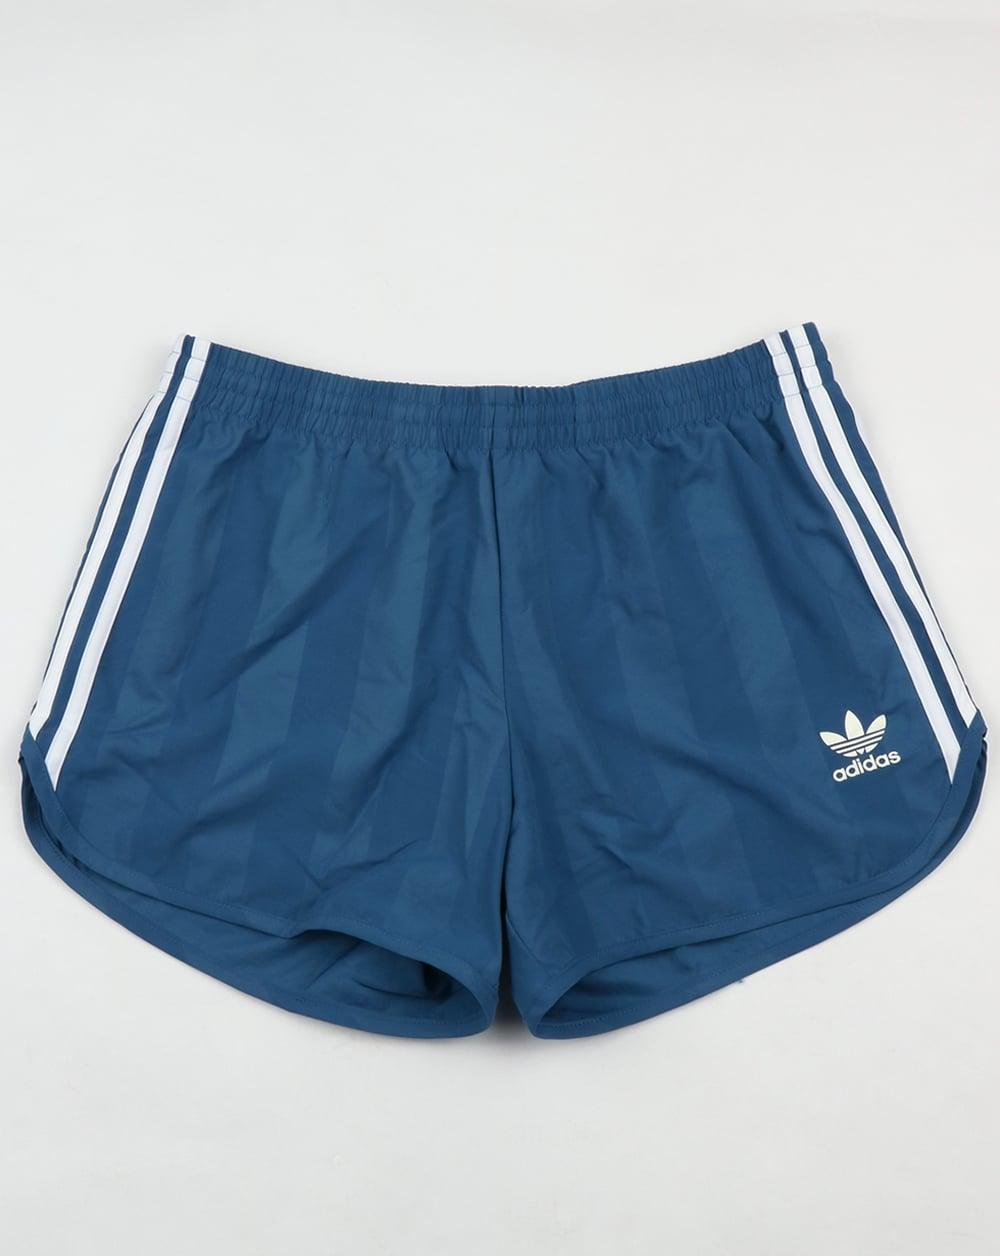 b062e61eb adidas Originals Adidas Originals Old skool Football Shorts Core Blue